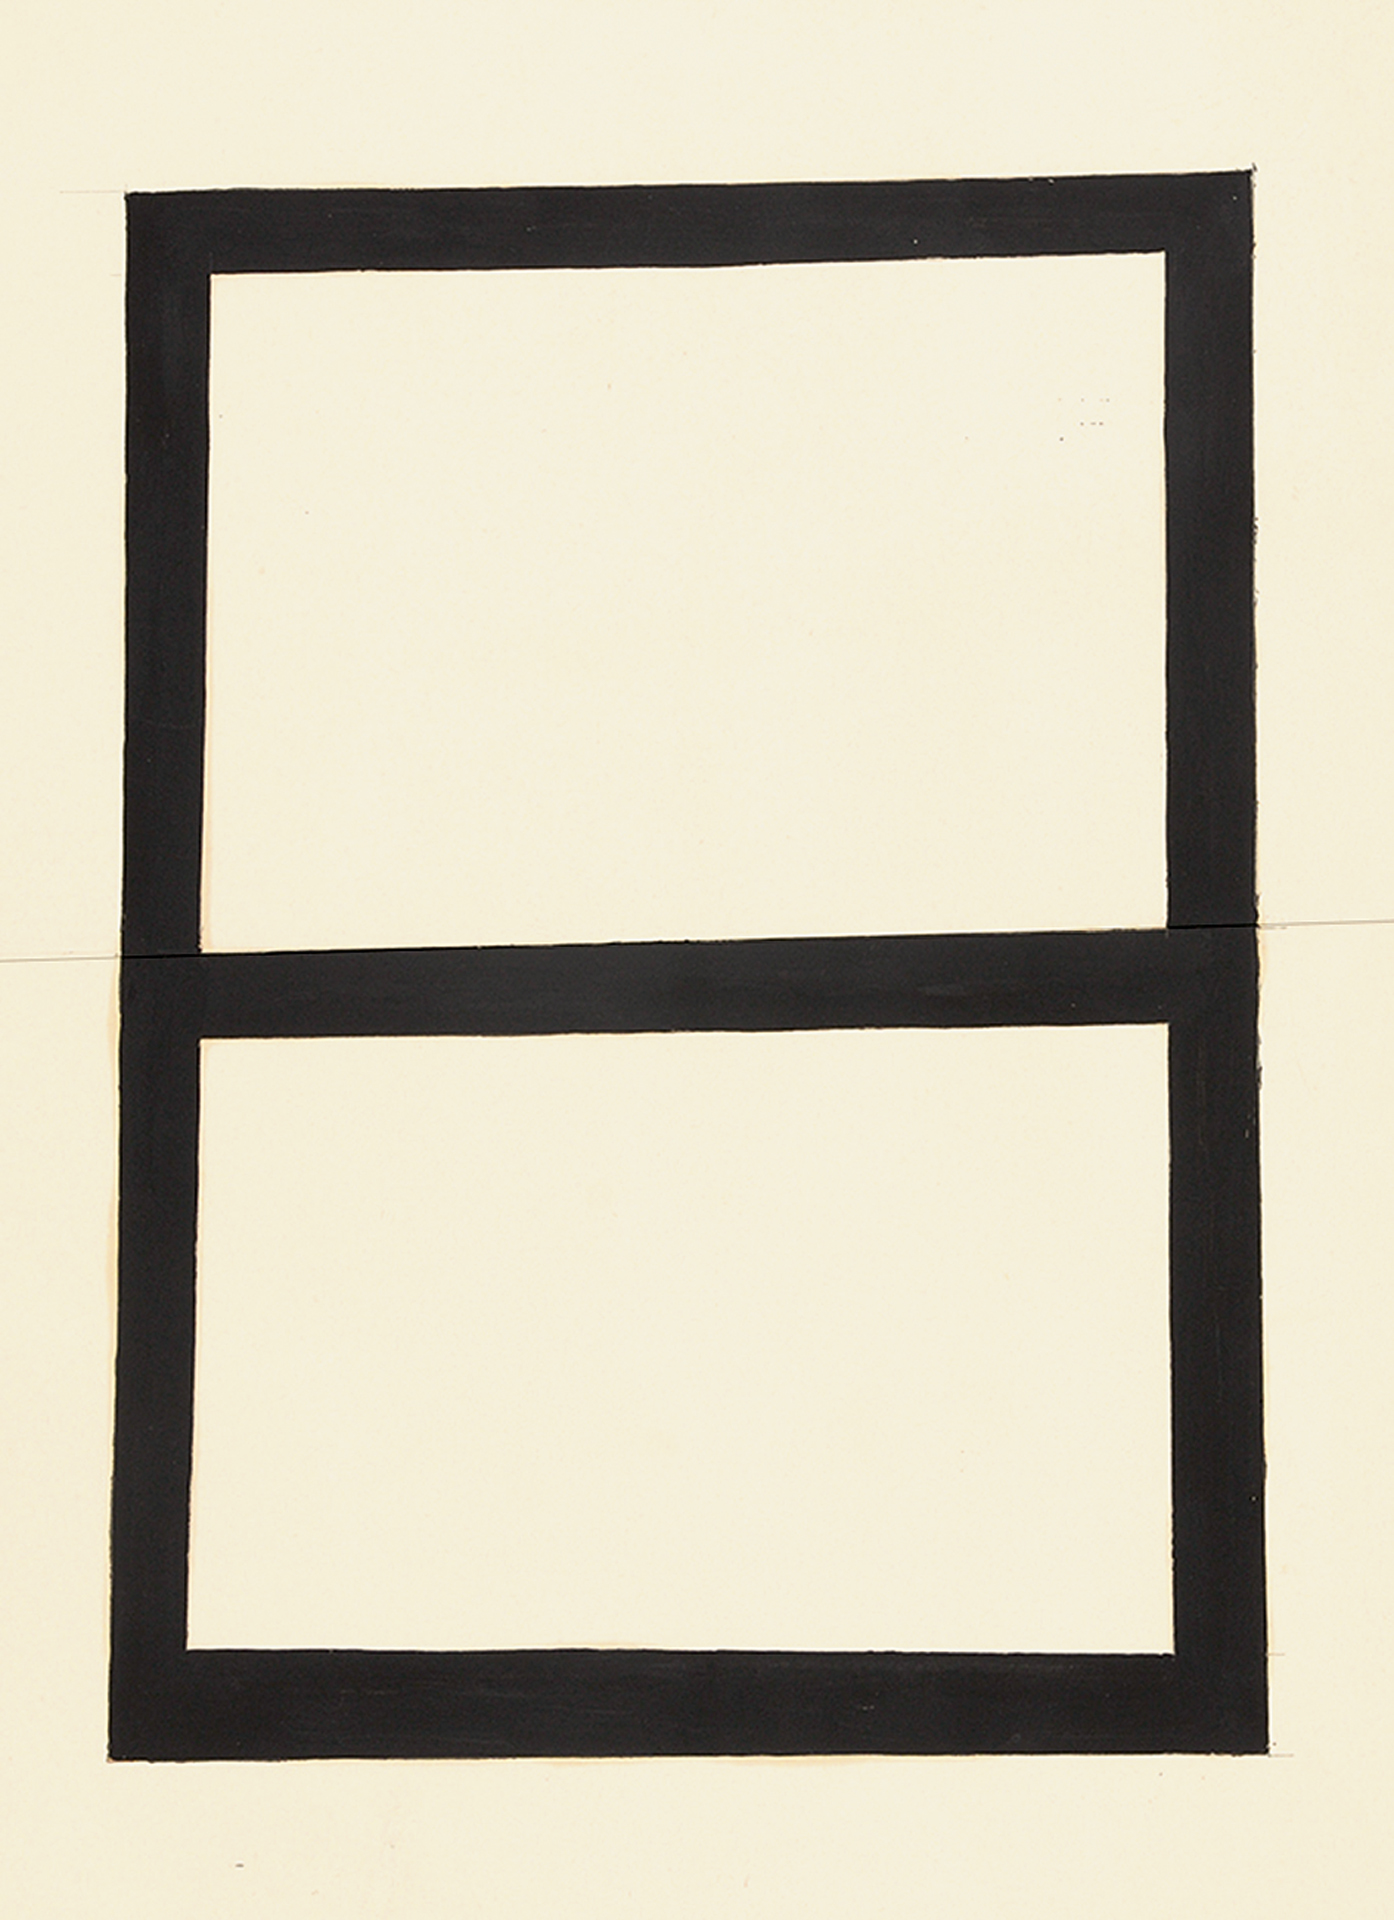 Helmut M. Federle, Untitled